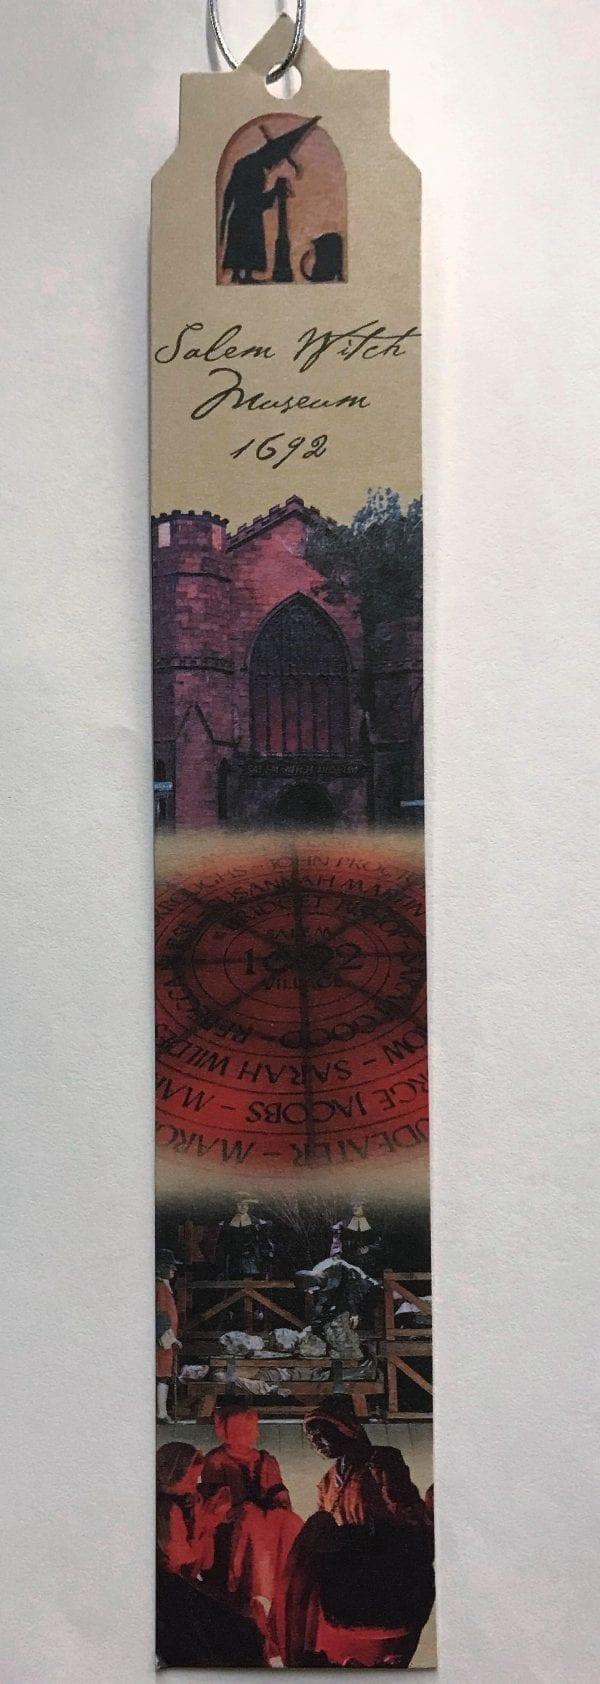 victims bookmark